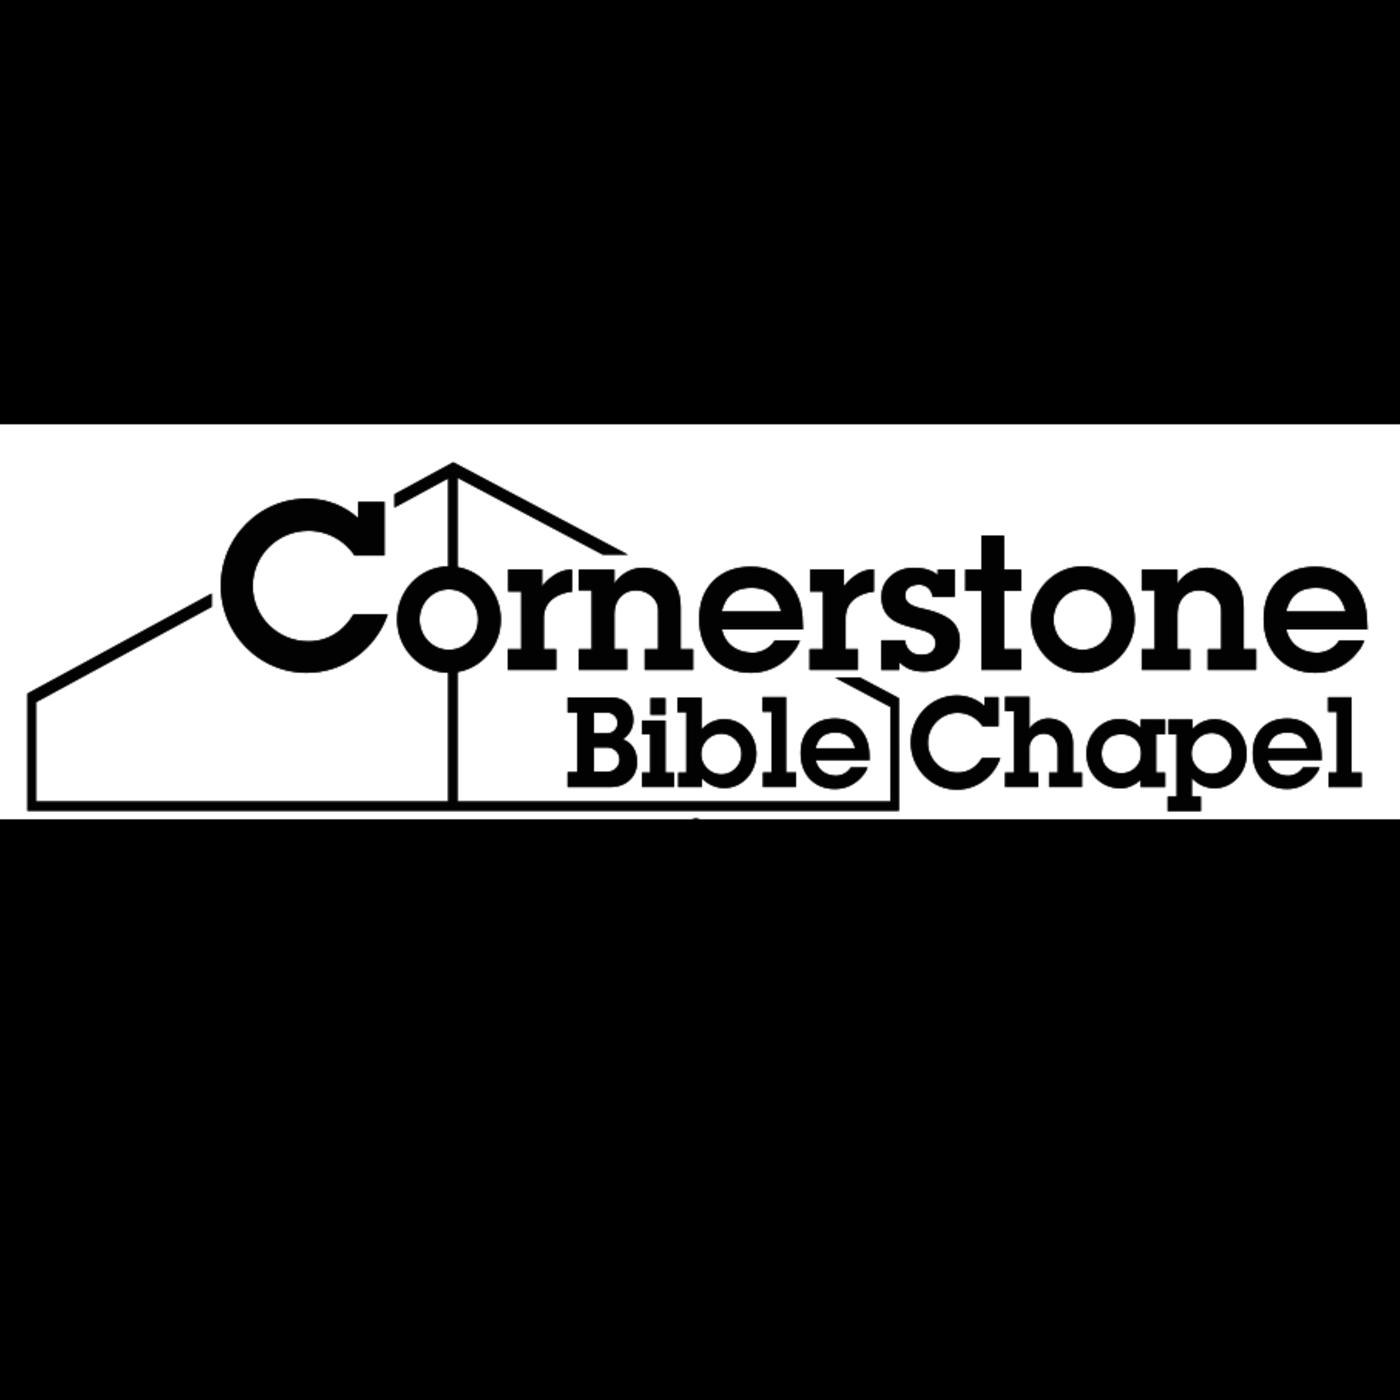 Cornerstone Bible Chapel Messages